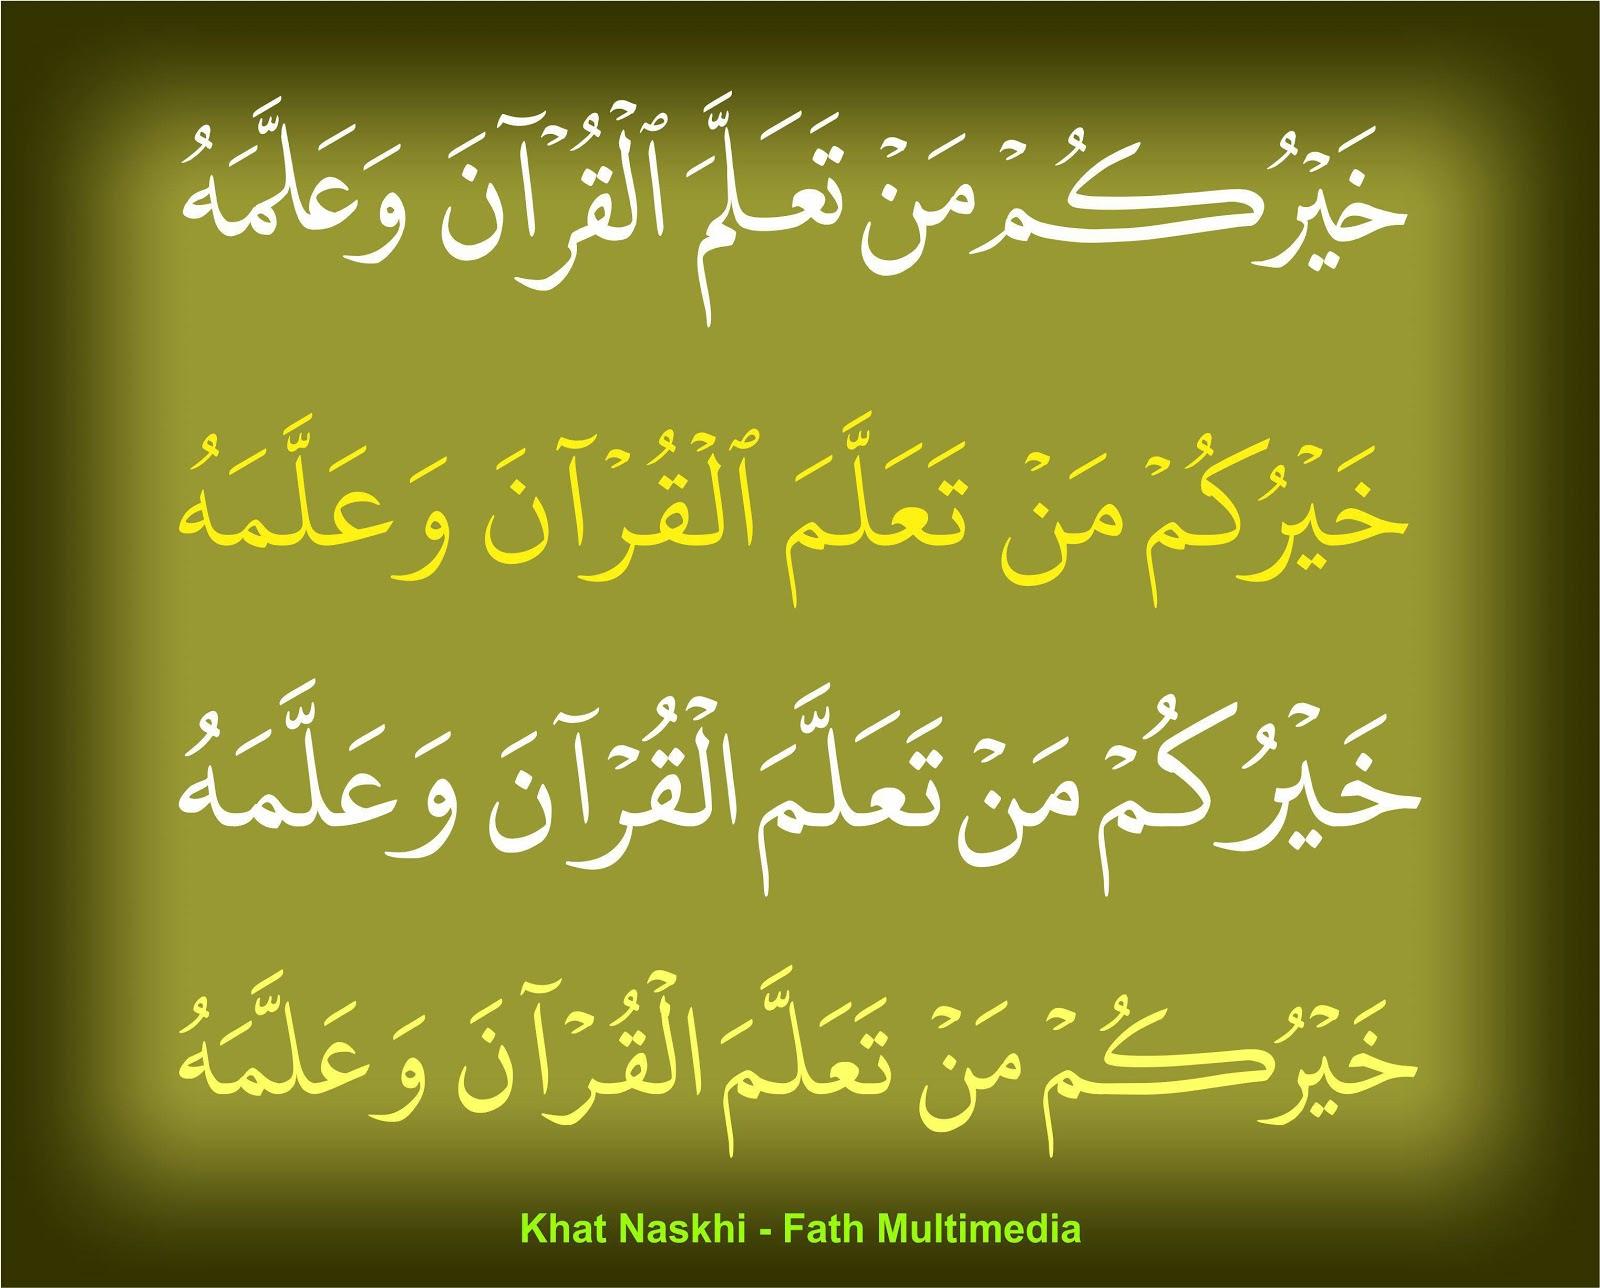 Contoh khat naskhi vektor arabic islamic calligraphy